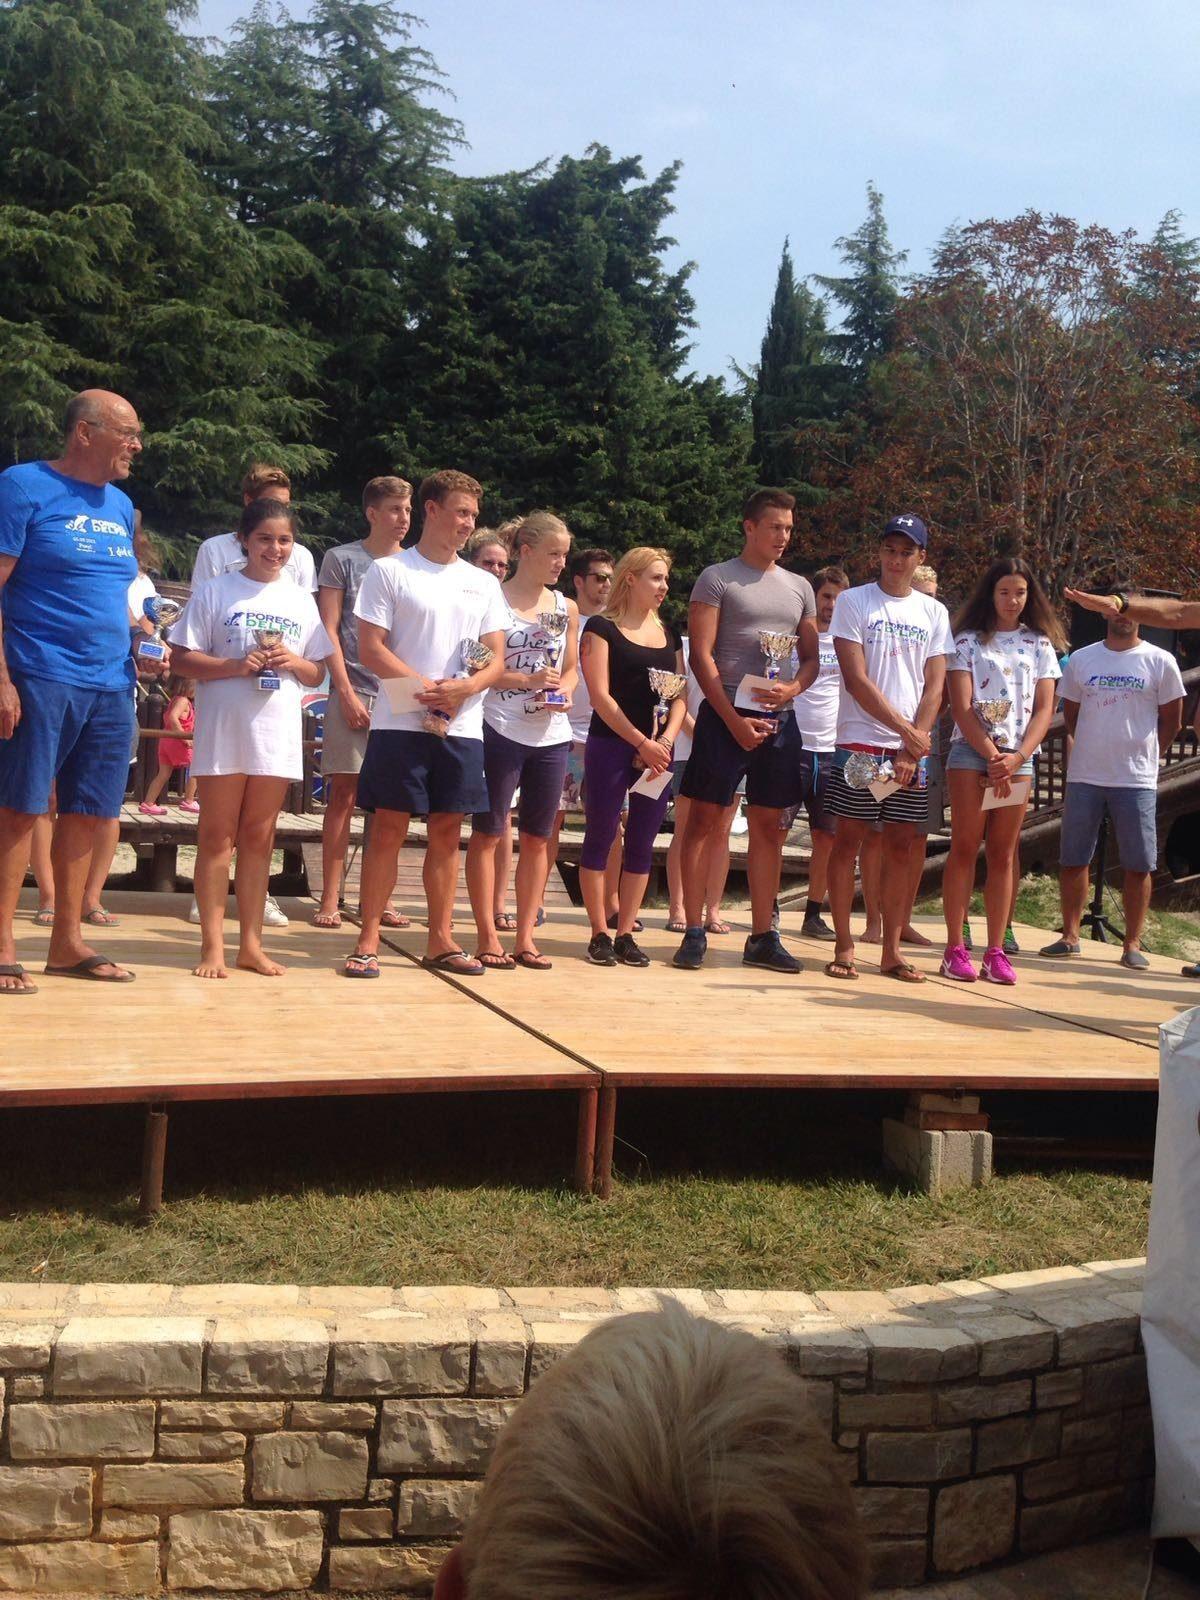 Porečki delfin – Cro Cup, Poreč 3.9.2016.